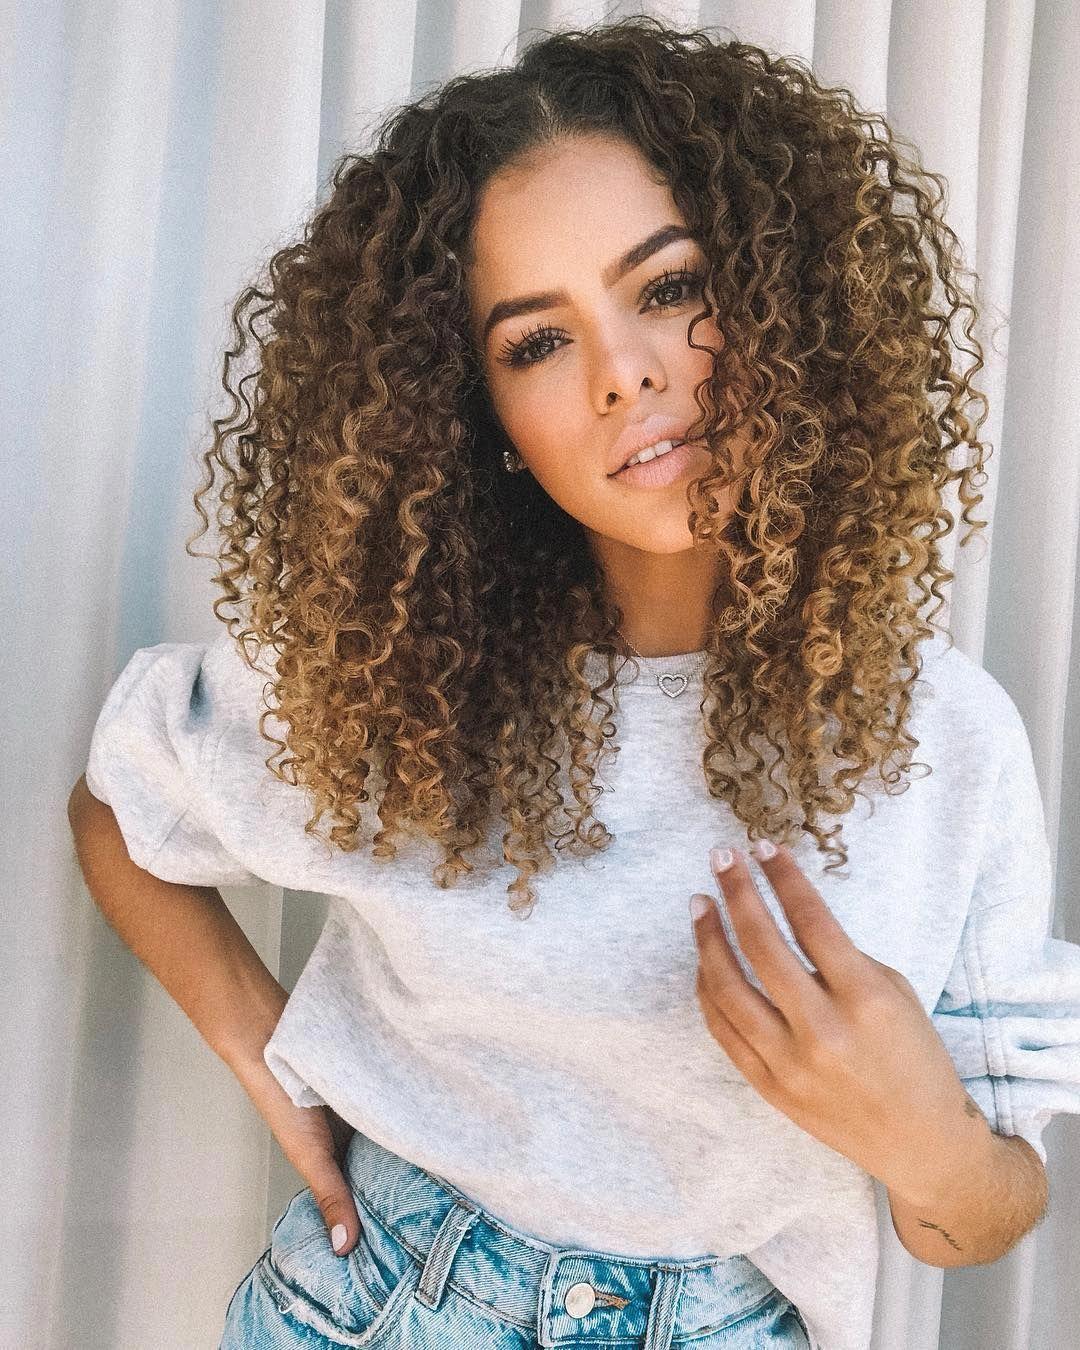 Alo Brasilia Dia 15 De Setembro Proximo Sabado Estarei No Big Box Supermercados Na Qi 05 Qi 08 Curly Hair Styles Naturally Curly Hair Styles Hair Styles